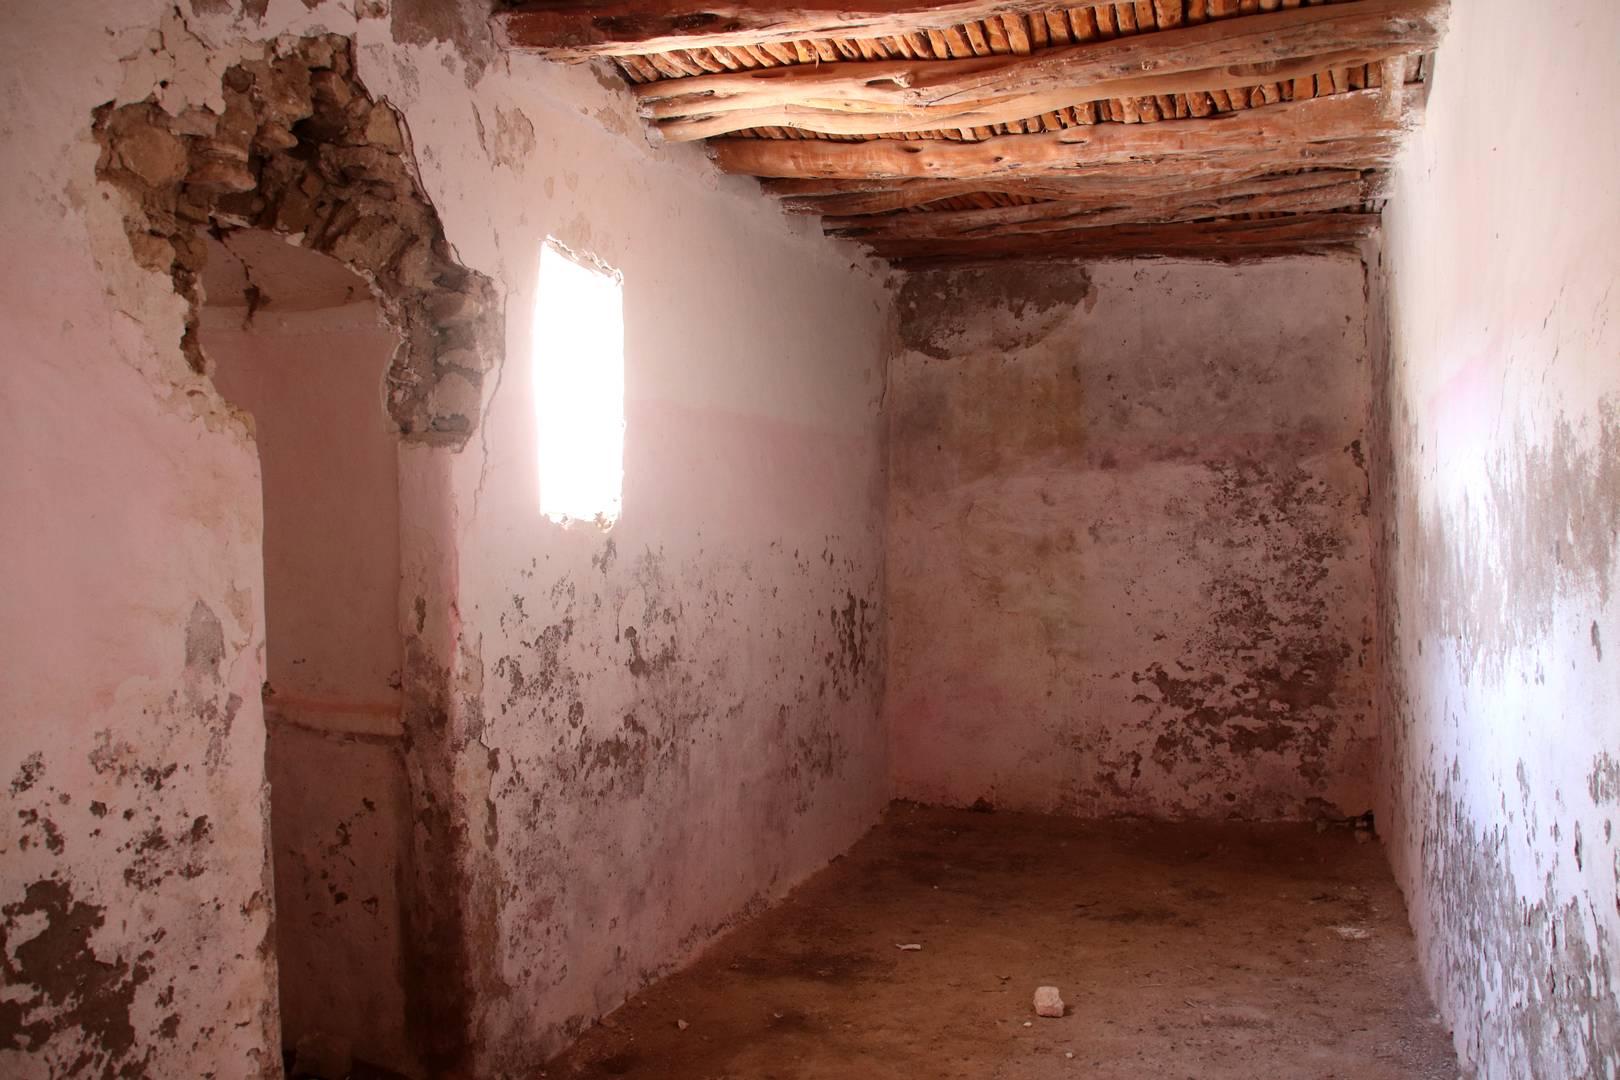 Maroc - Salle de prière du marabout de Sidi M'barek au Sud d'Essaouira